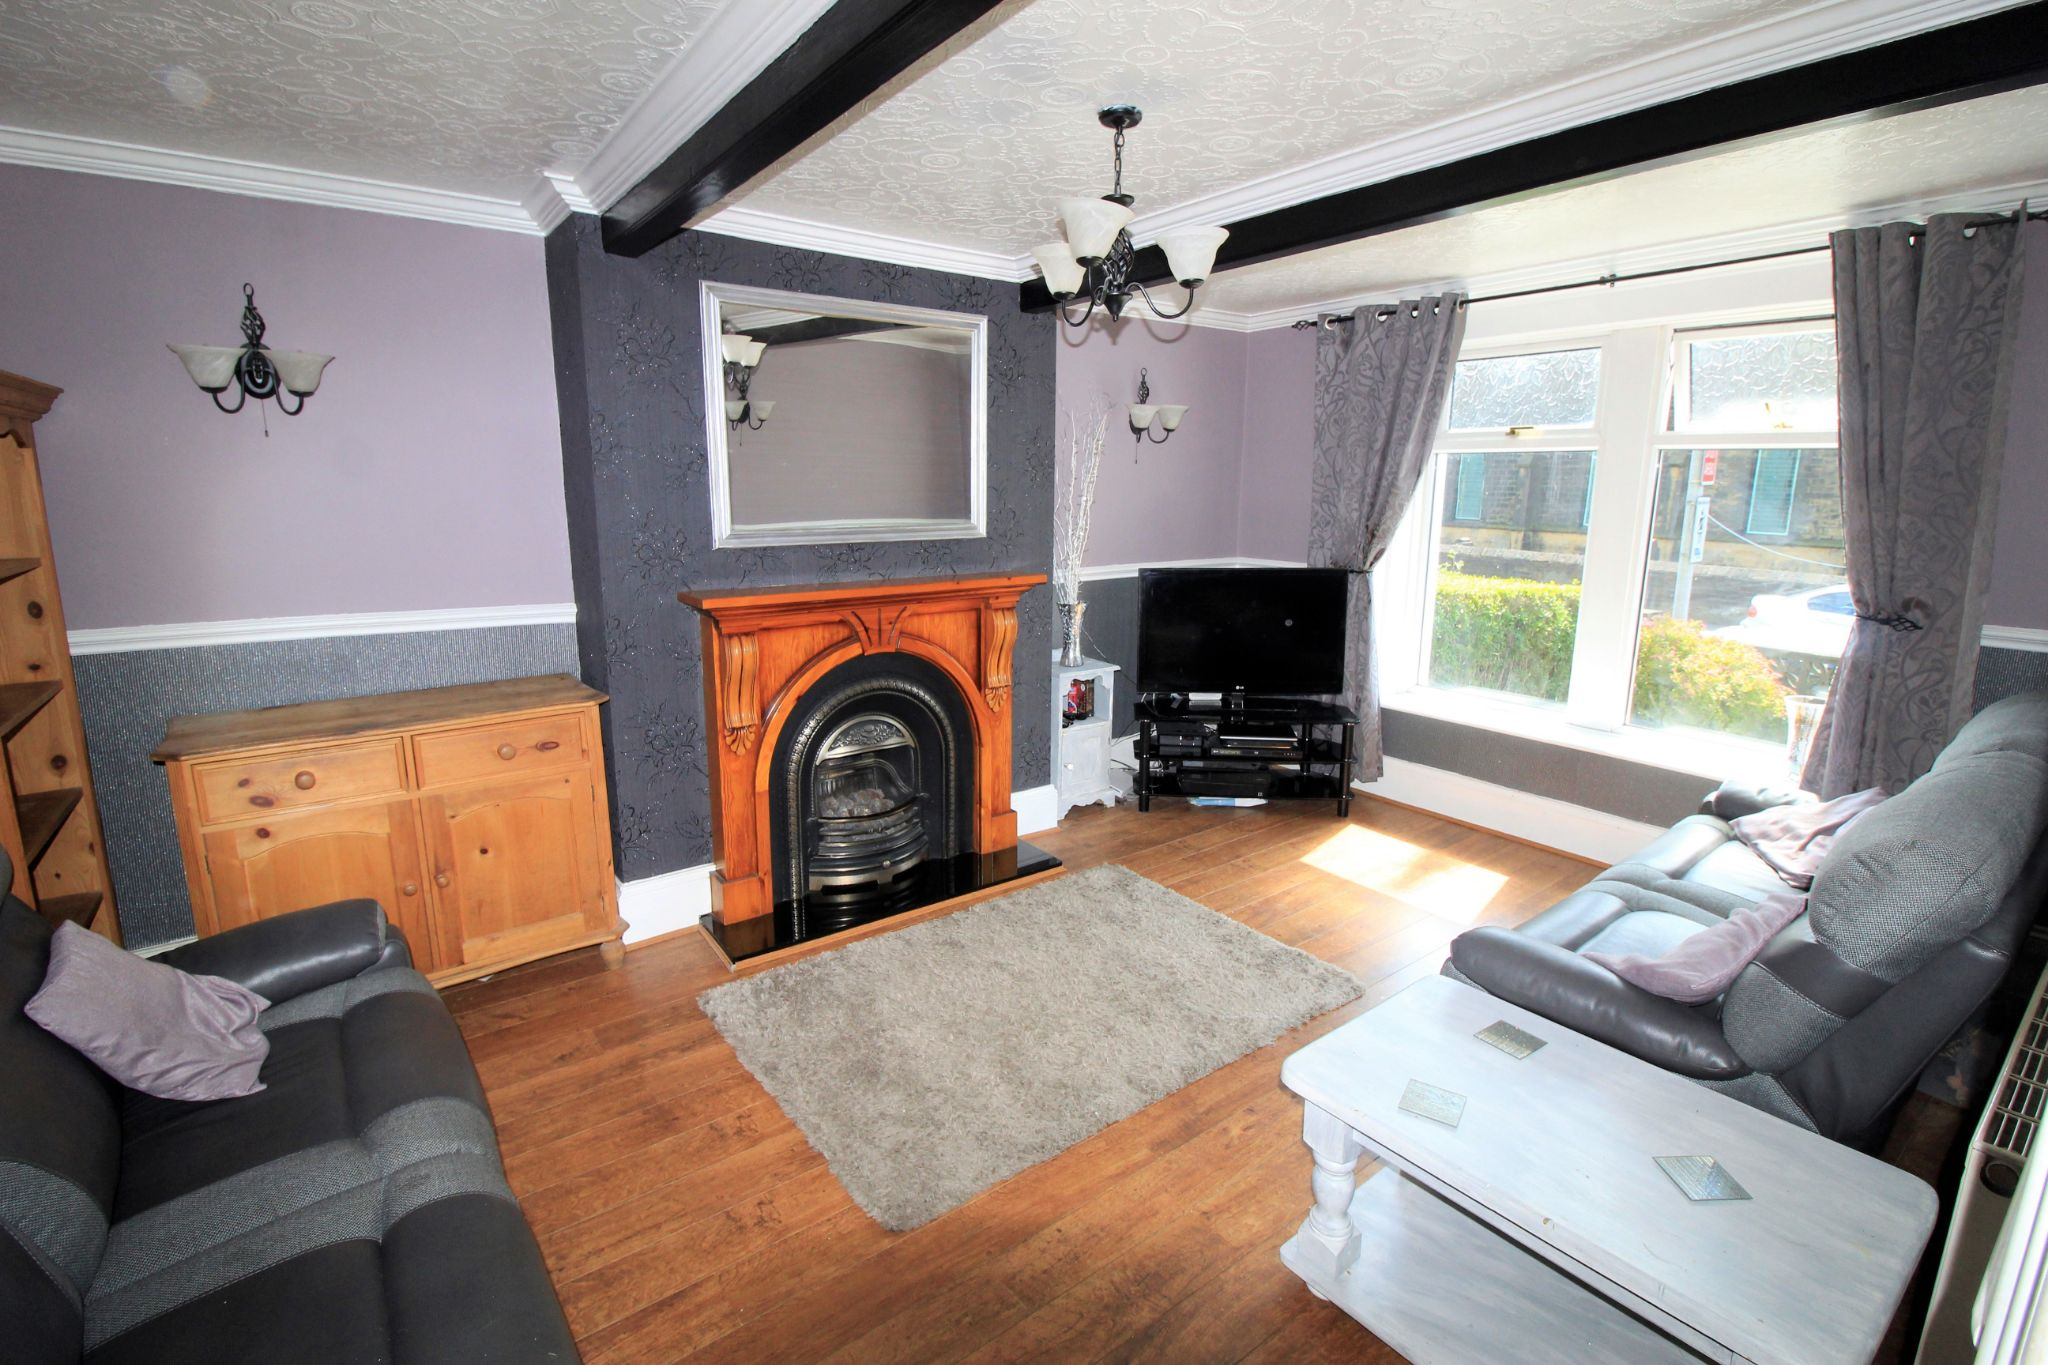 3 bedroom mid terraced house SSTC in Bradford - Lounge